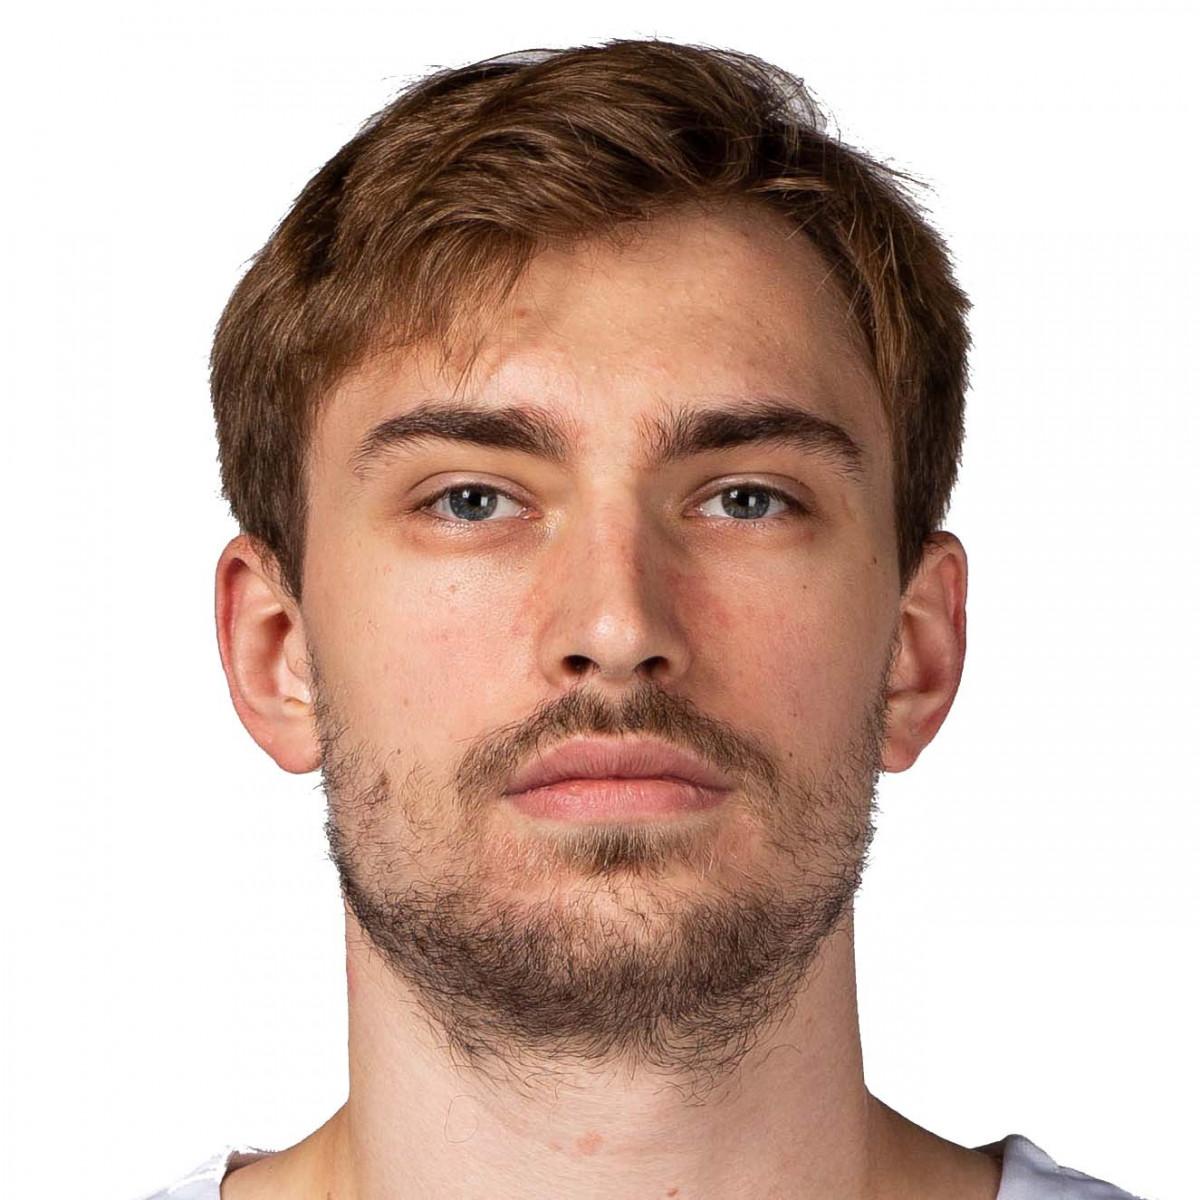 Aleksandr Gankevich